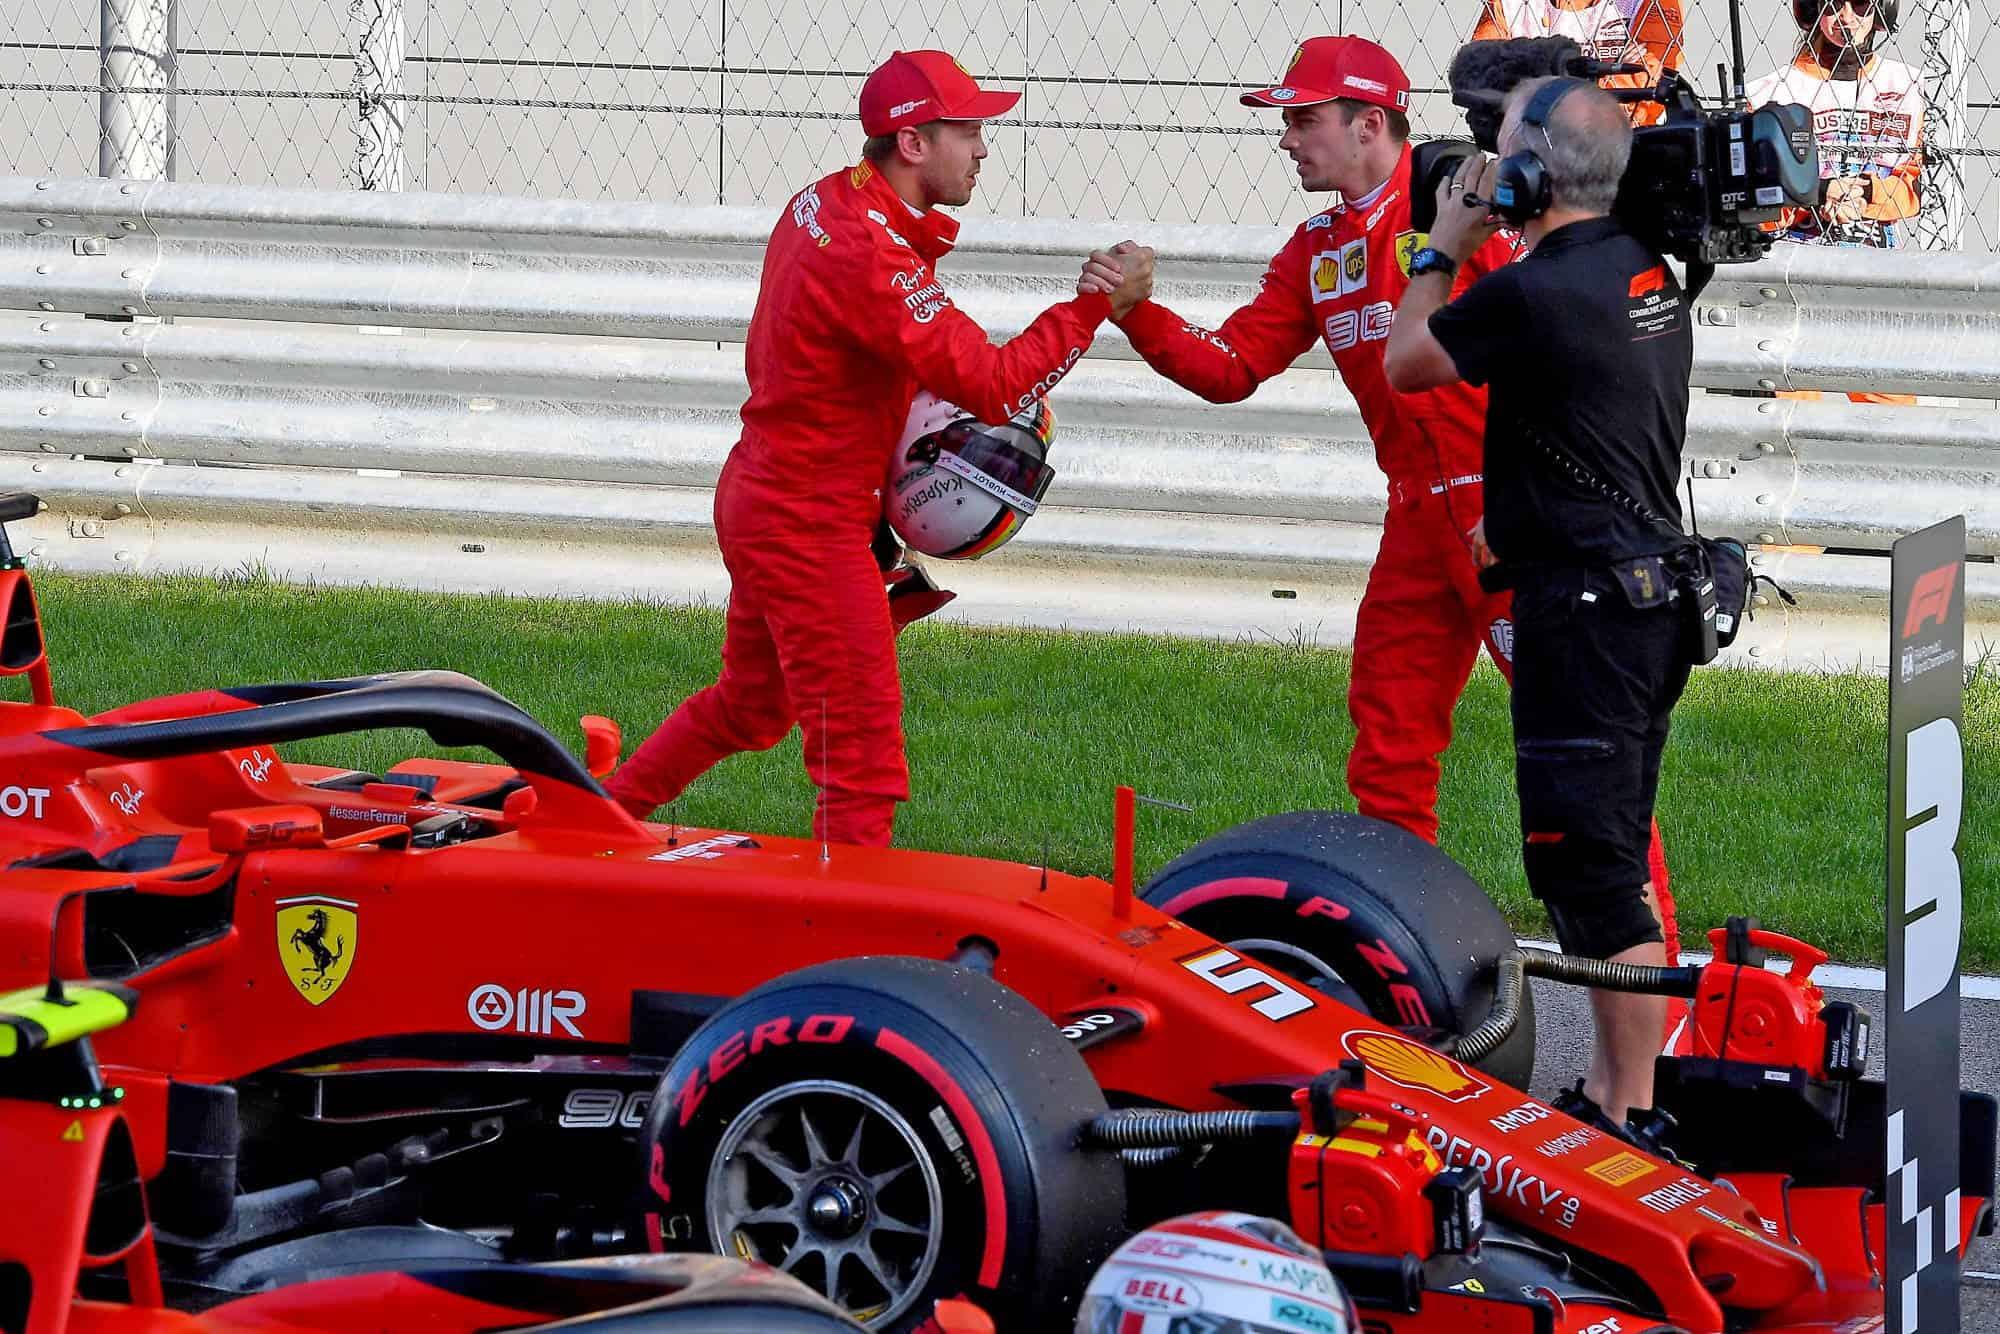 Charles Leclerc and Sebastian Vettel Ferrari Russian GP F1 2019 post qualifying Photo Ferrari